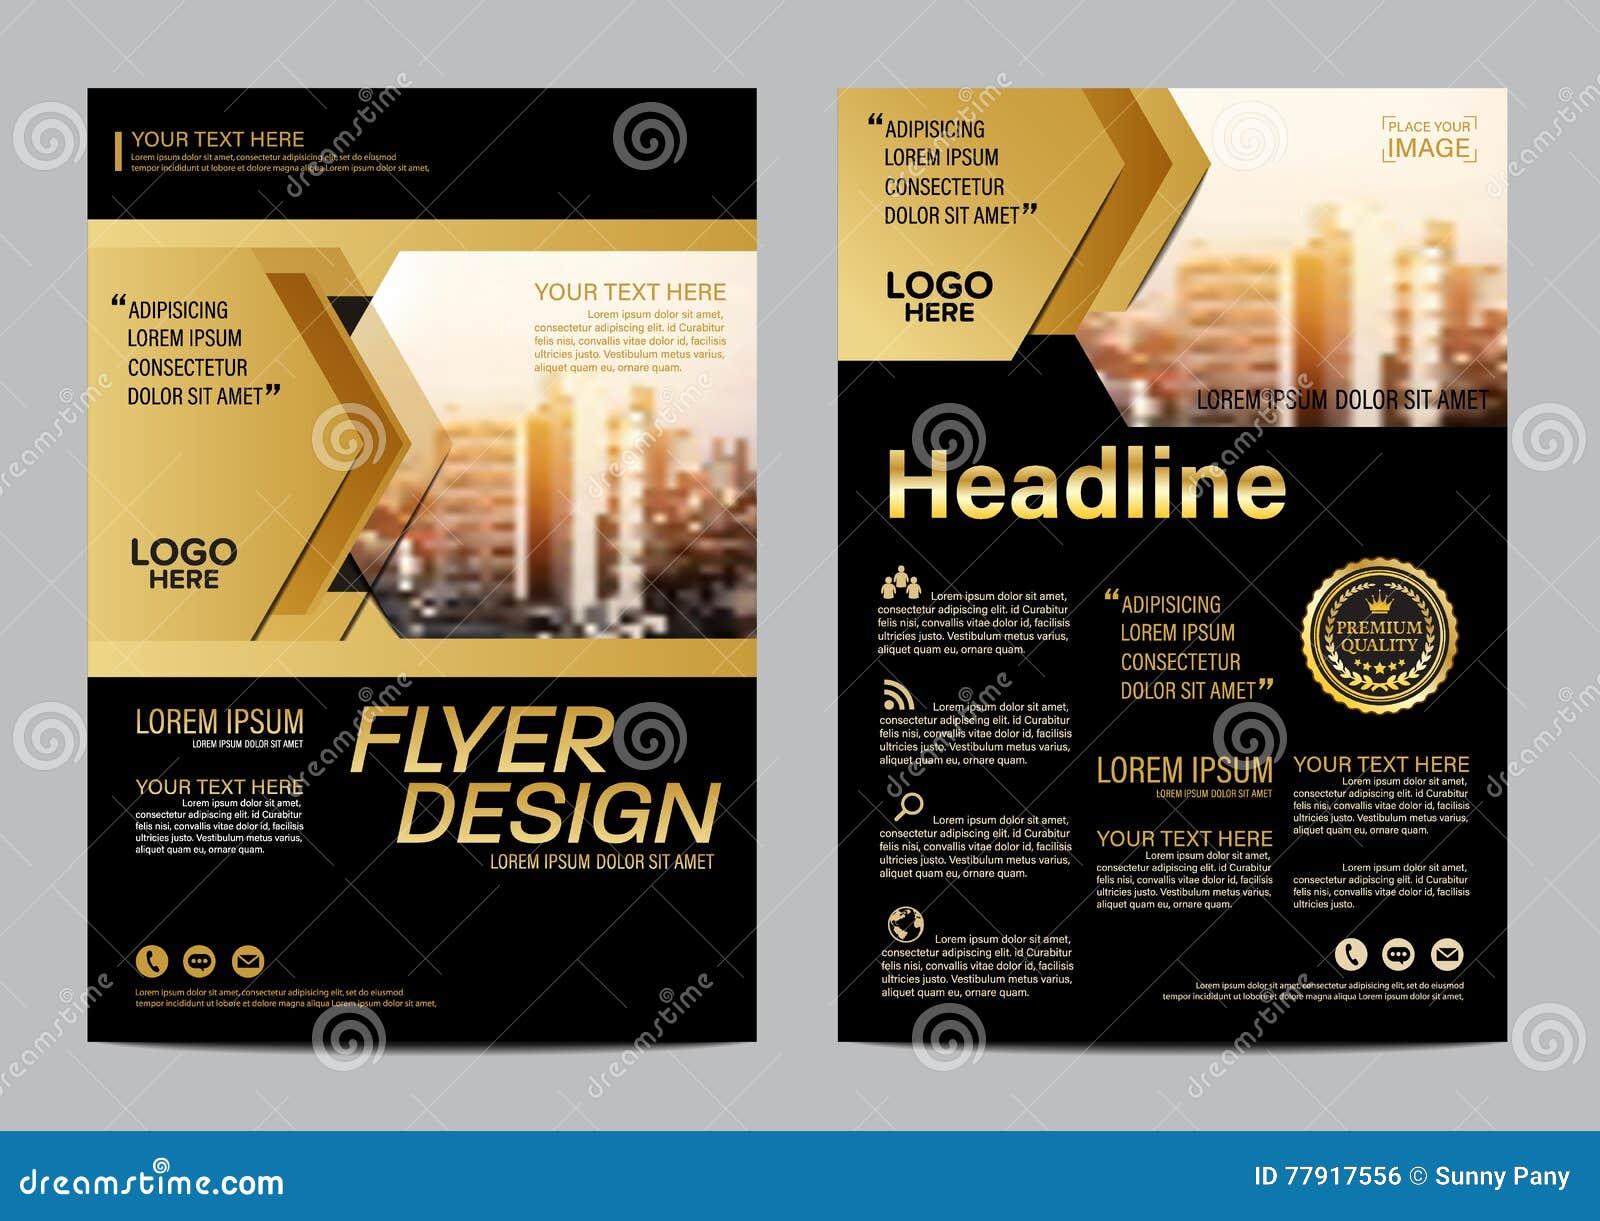 Gold Brochure Layout design template. Annual Report Flyer Leaflet cover Presentation Modern background. illustration vector in A4